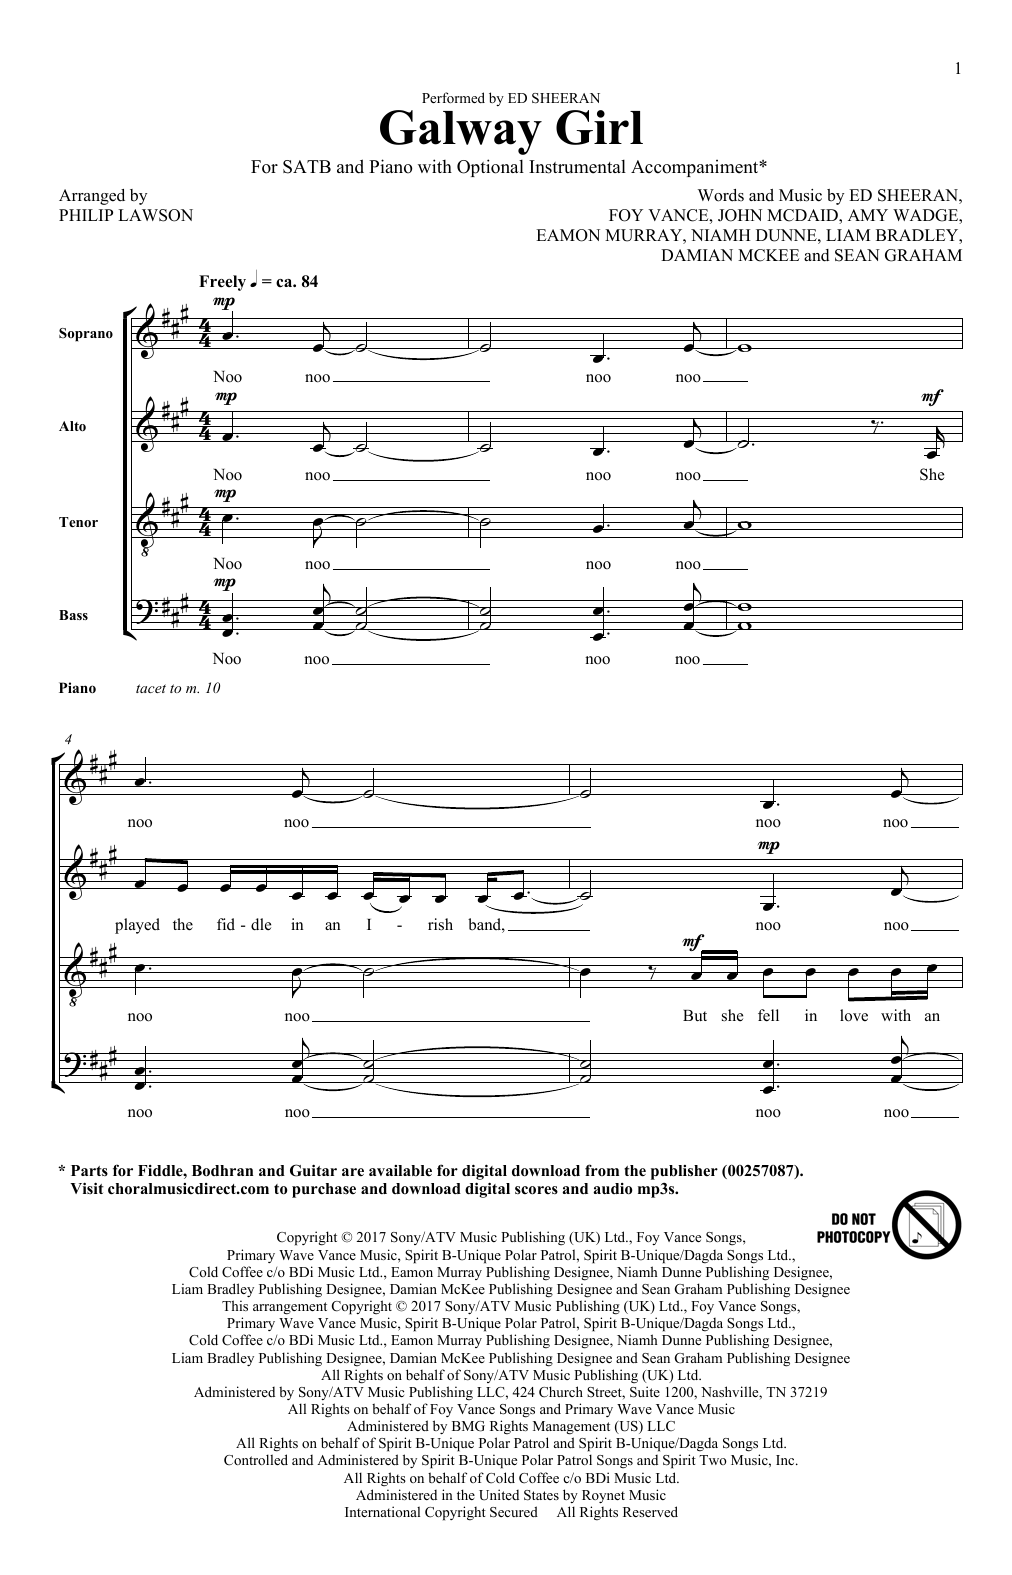 Sheet music digital files to print licensed foy vance digital sheet music digital by merriam music hexwebz Images